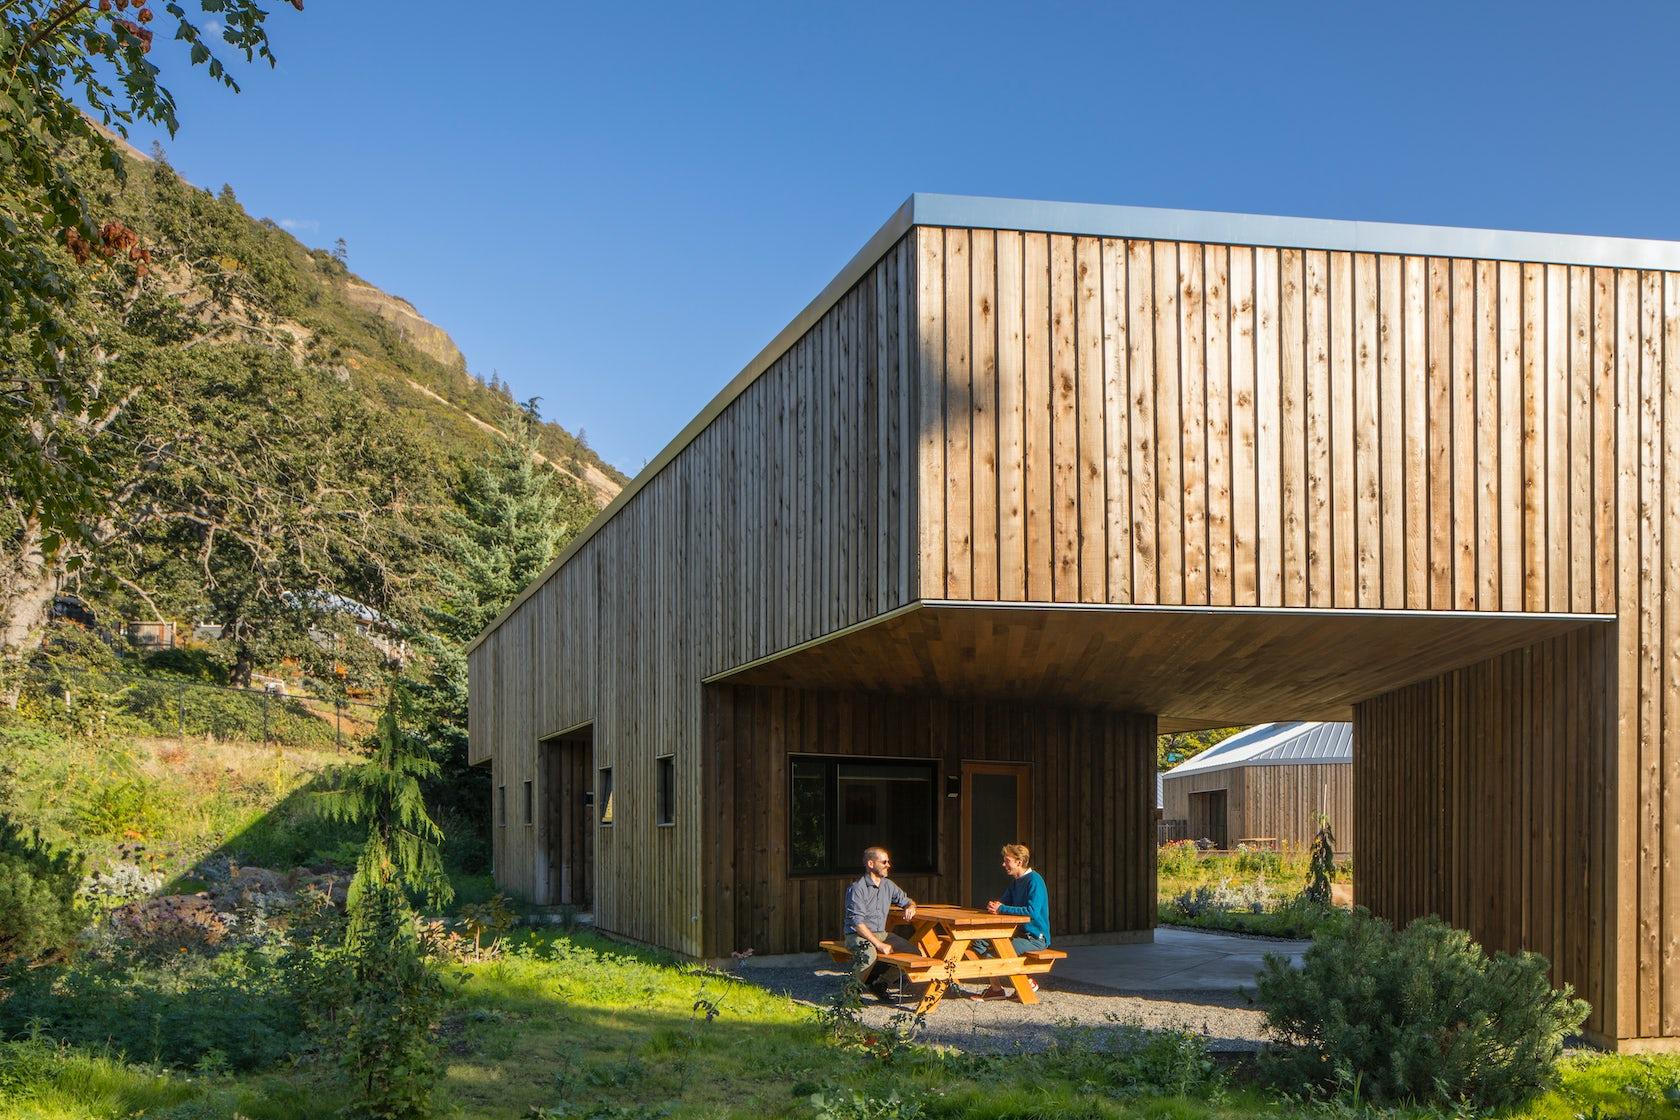 © Waechter Architecture